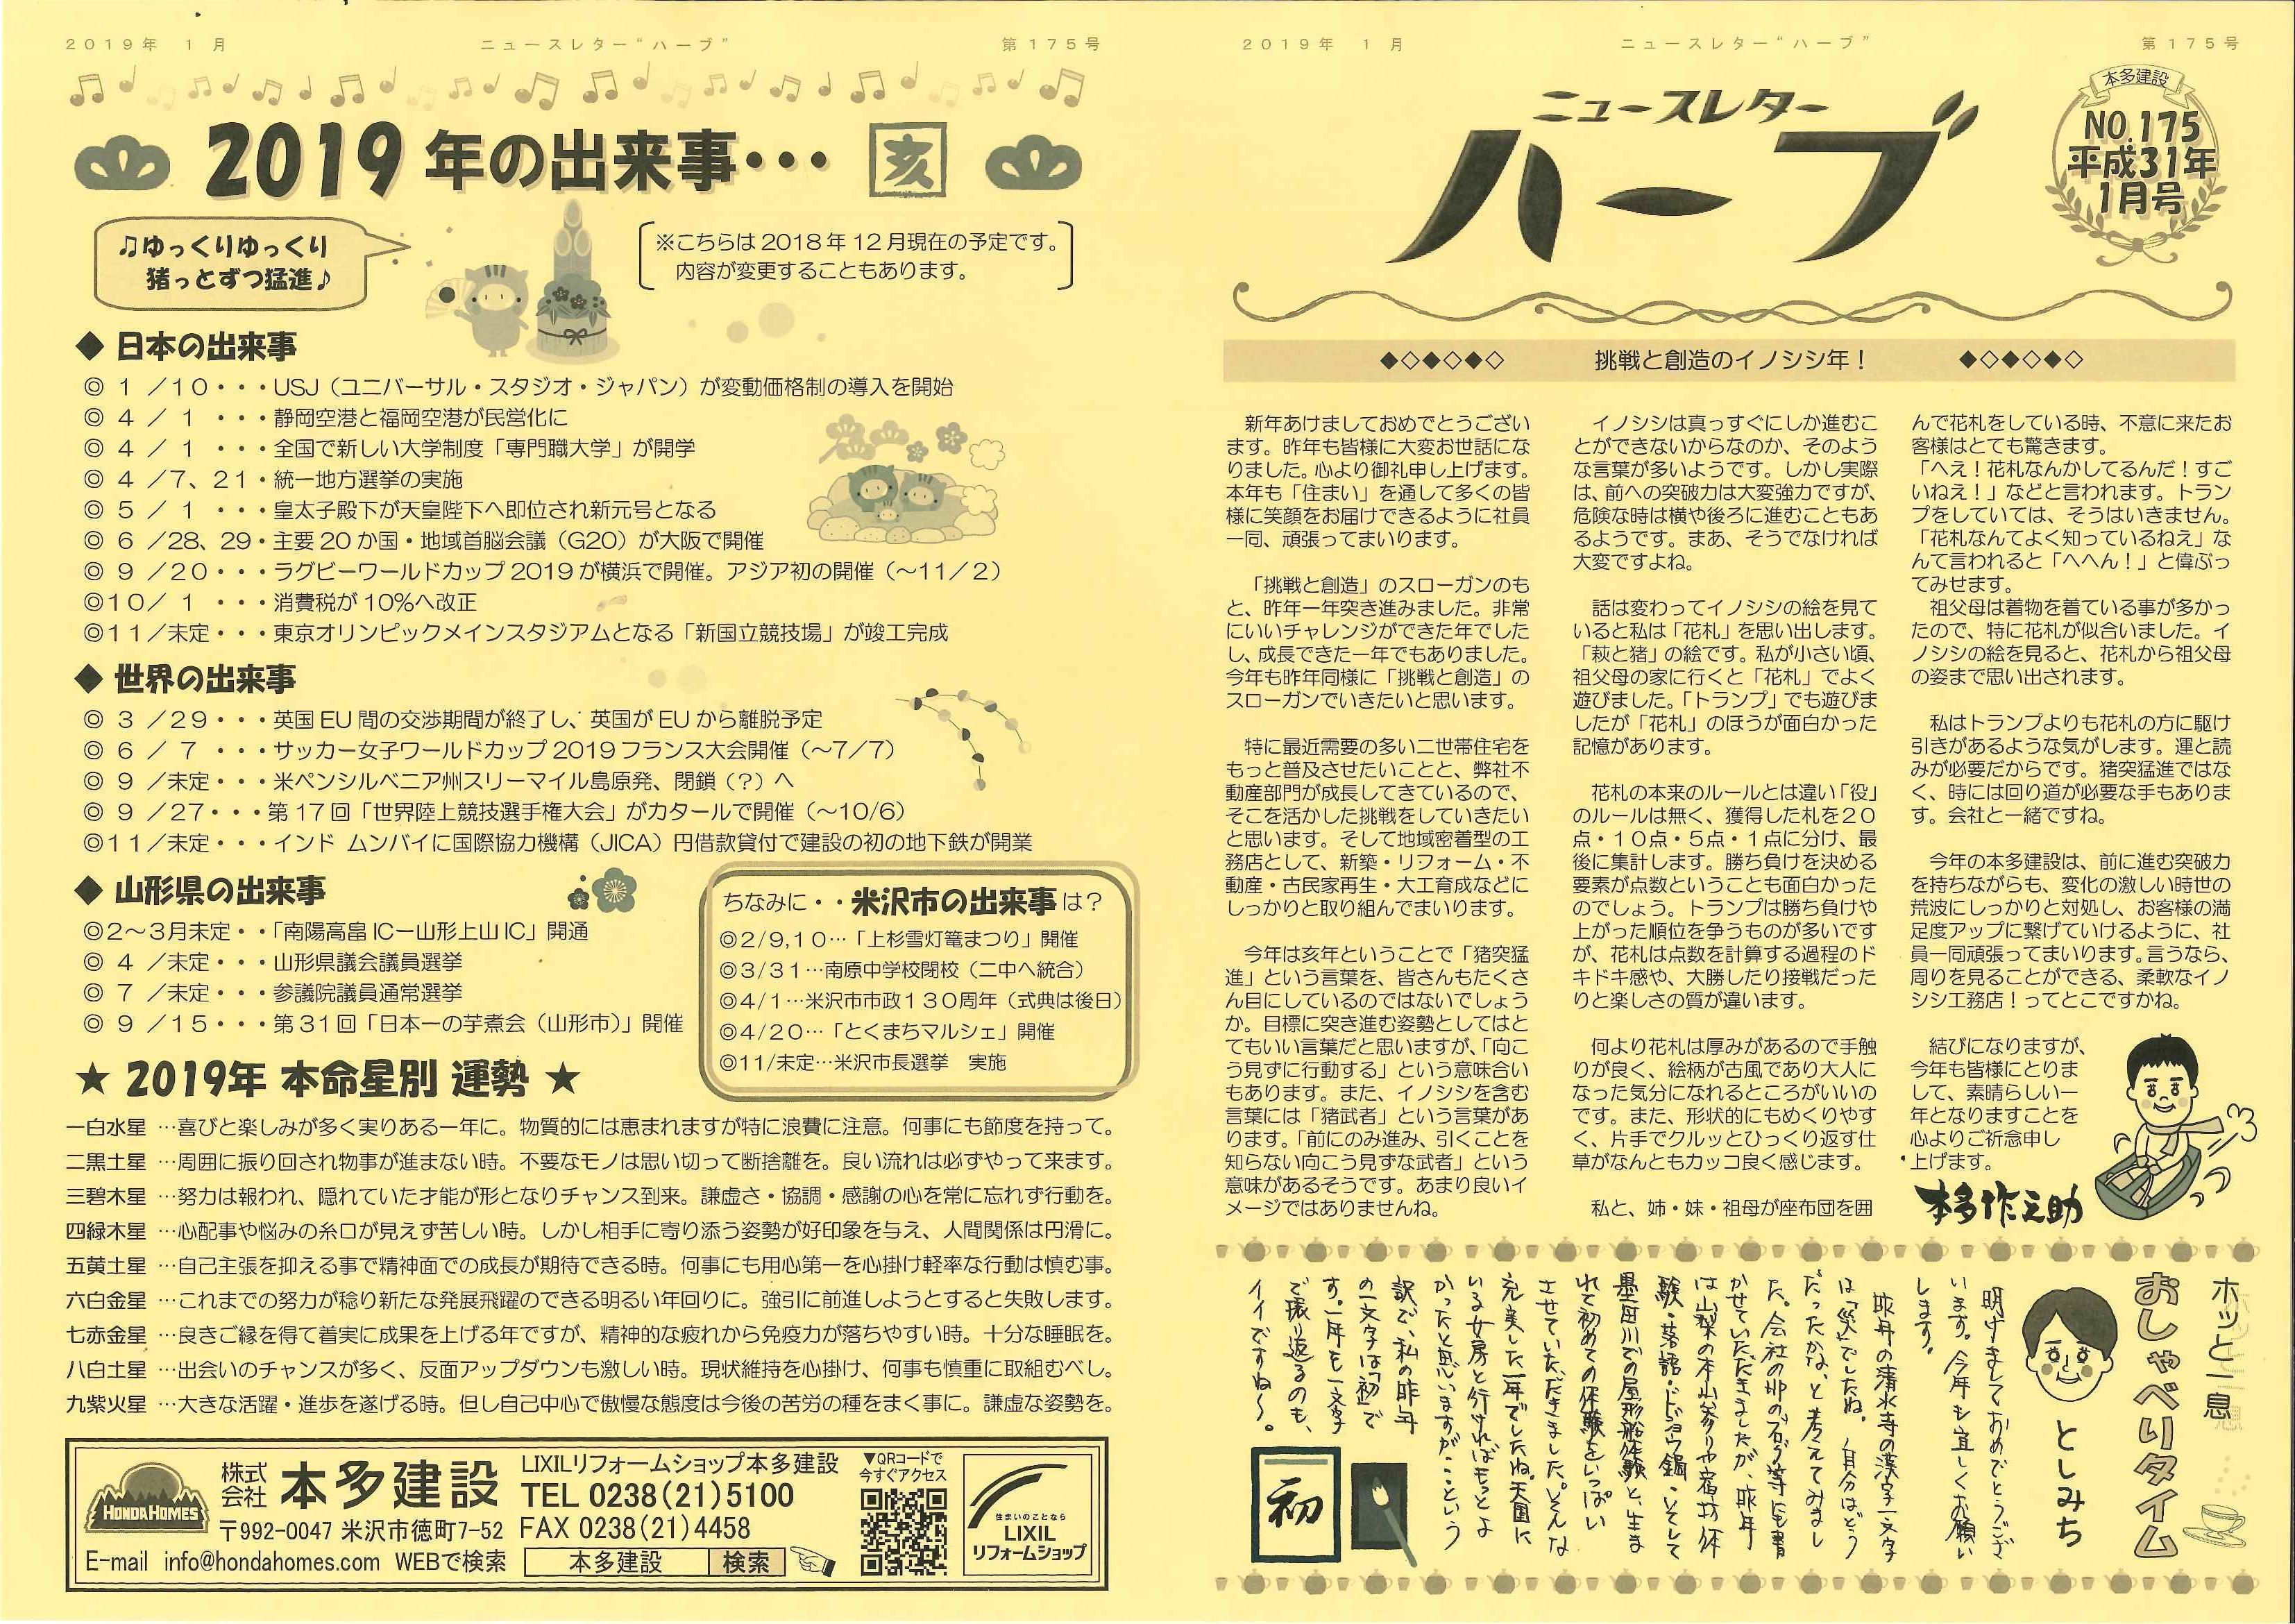 https://lixil-reformshop.jp/shop/SP00000487/photos/20190109113529529_0001.jpg